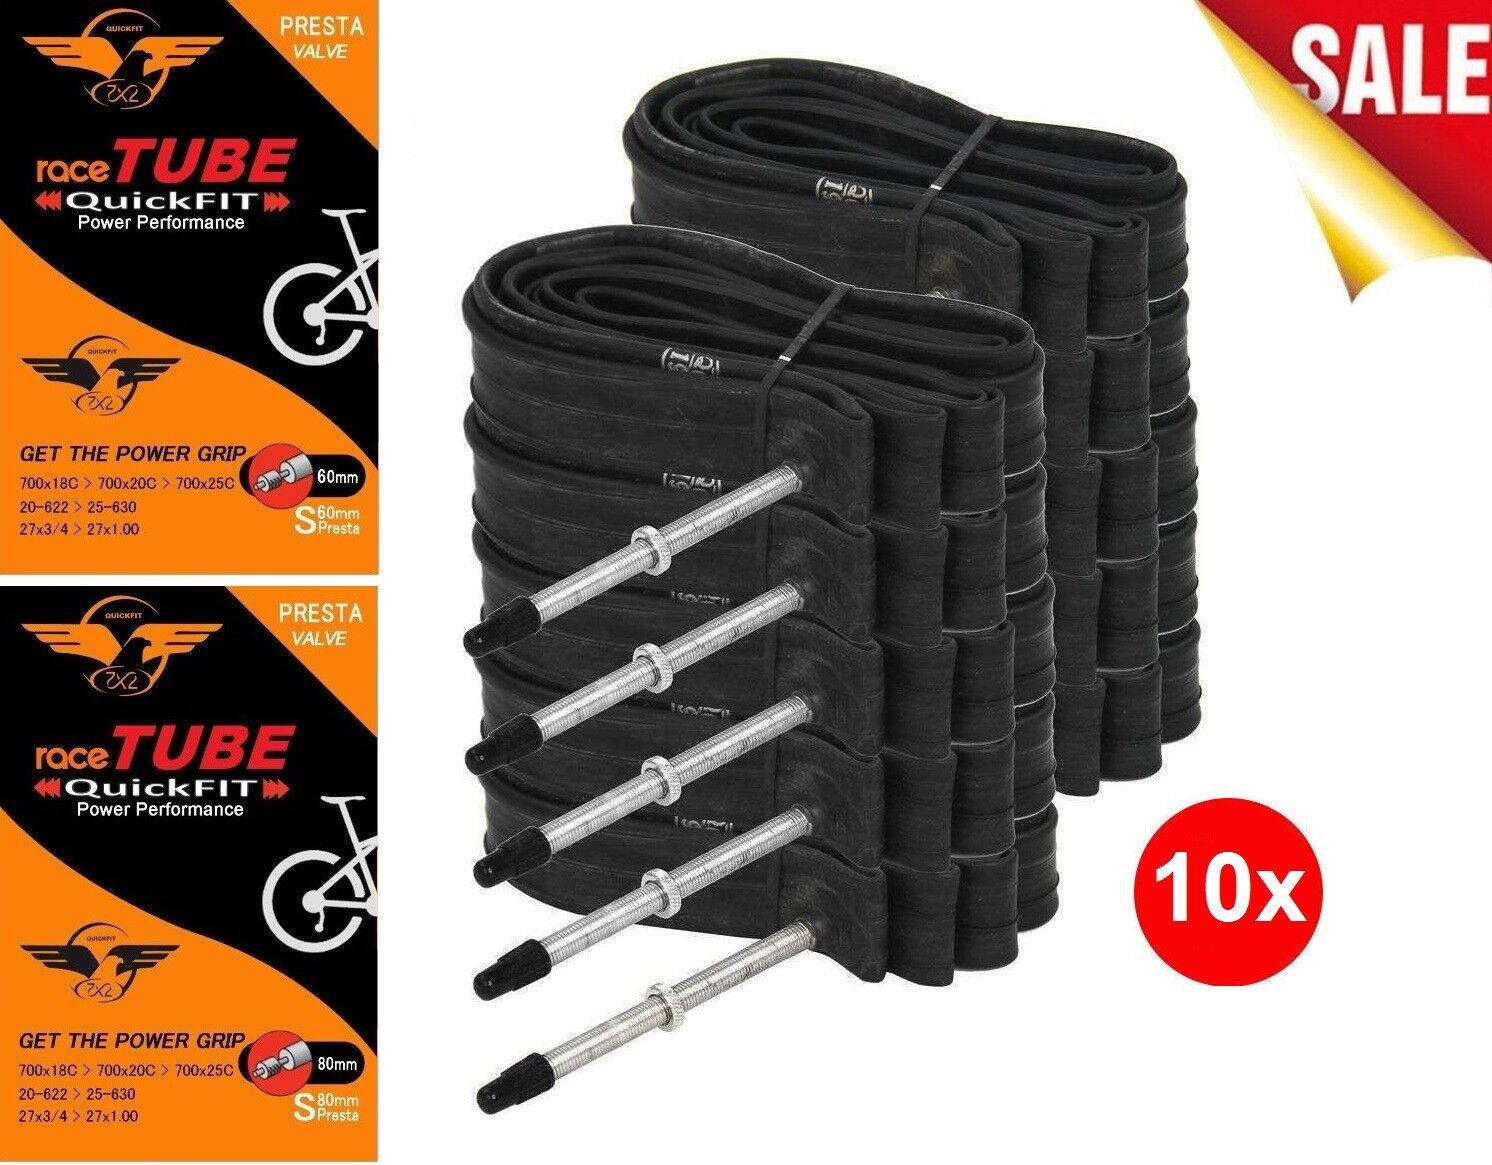 2-PACK 700x18-25c 48-60-80 mm Threaded PRESTA Valve Bicycle Inner Tubes Road